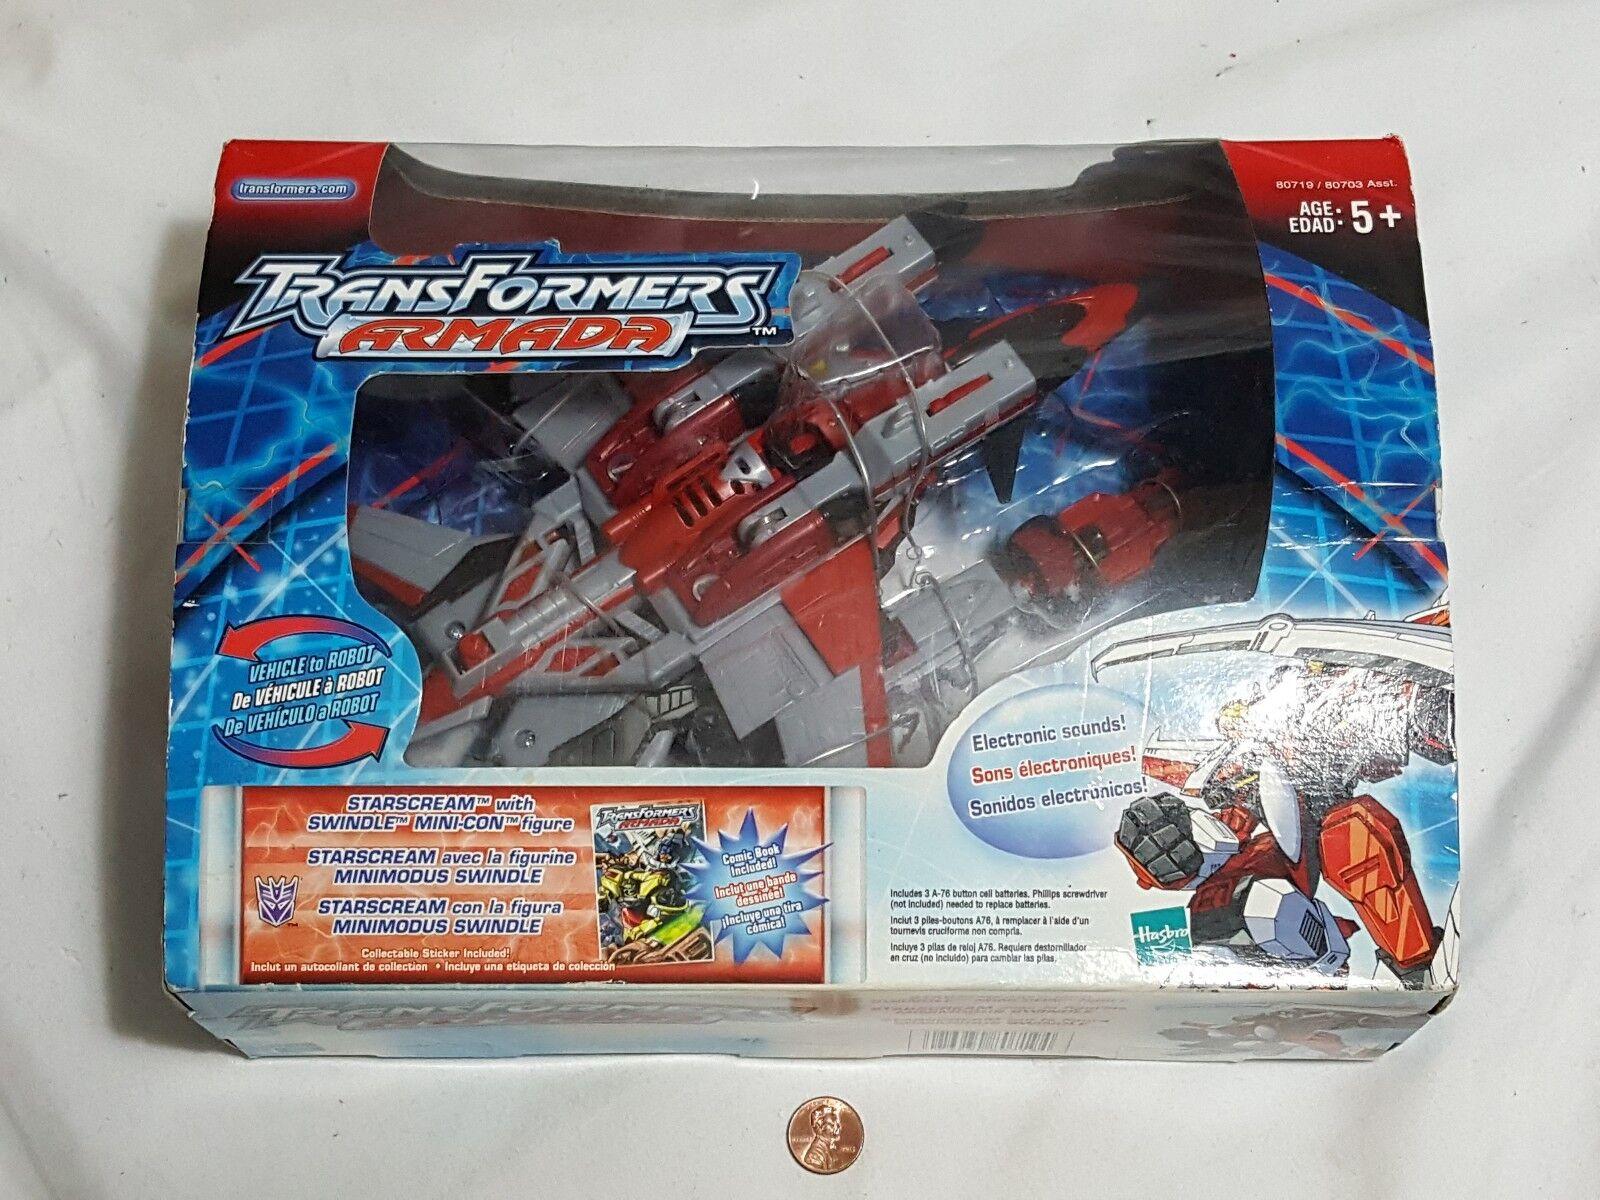 NEW Transformers Armada Starscream with Swindle Mini-con Action Figure SEALED